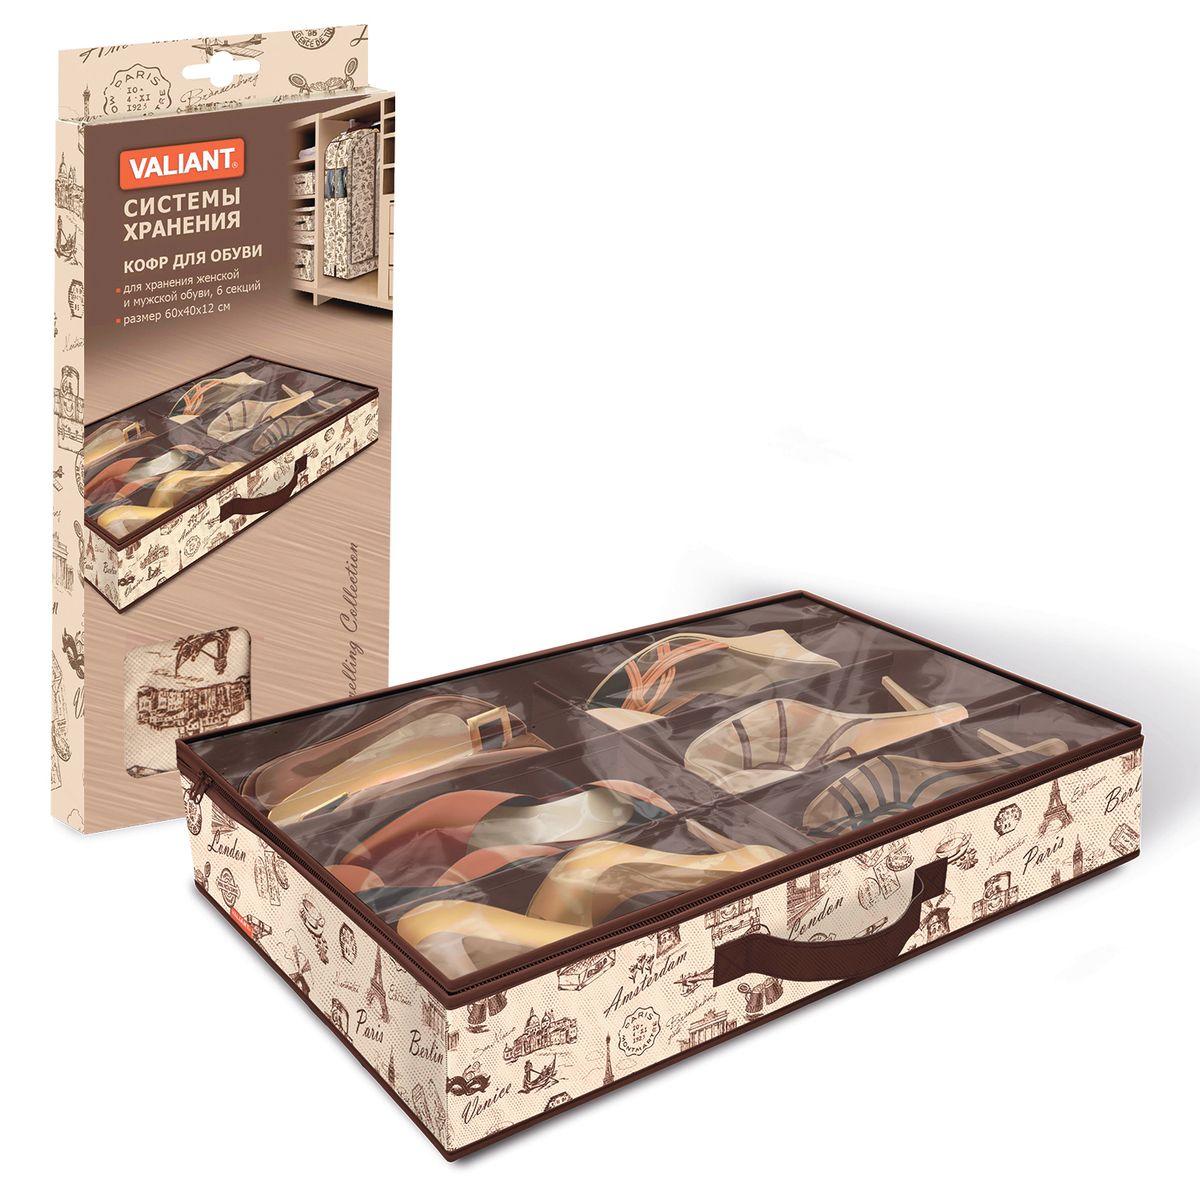 Кофр для хранения обуви Valiant Collection, 6 секций, 60 х 40 х 12 смTR-S6